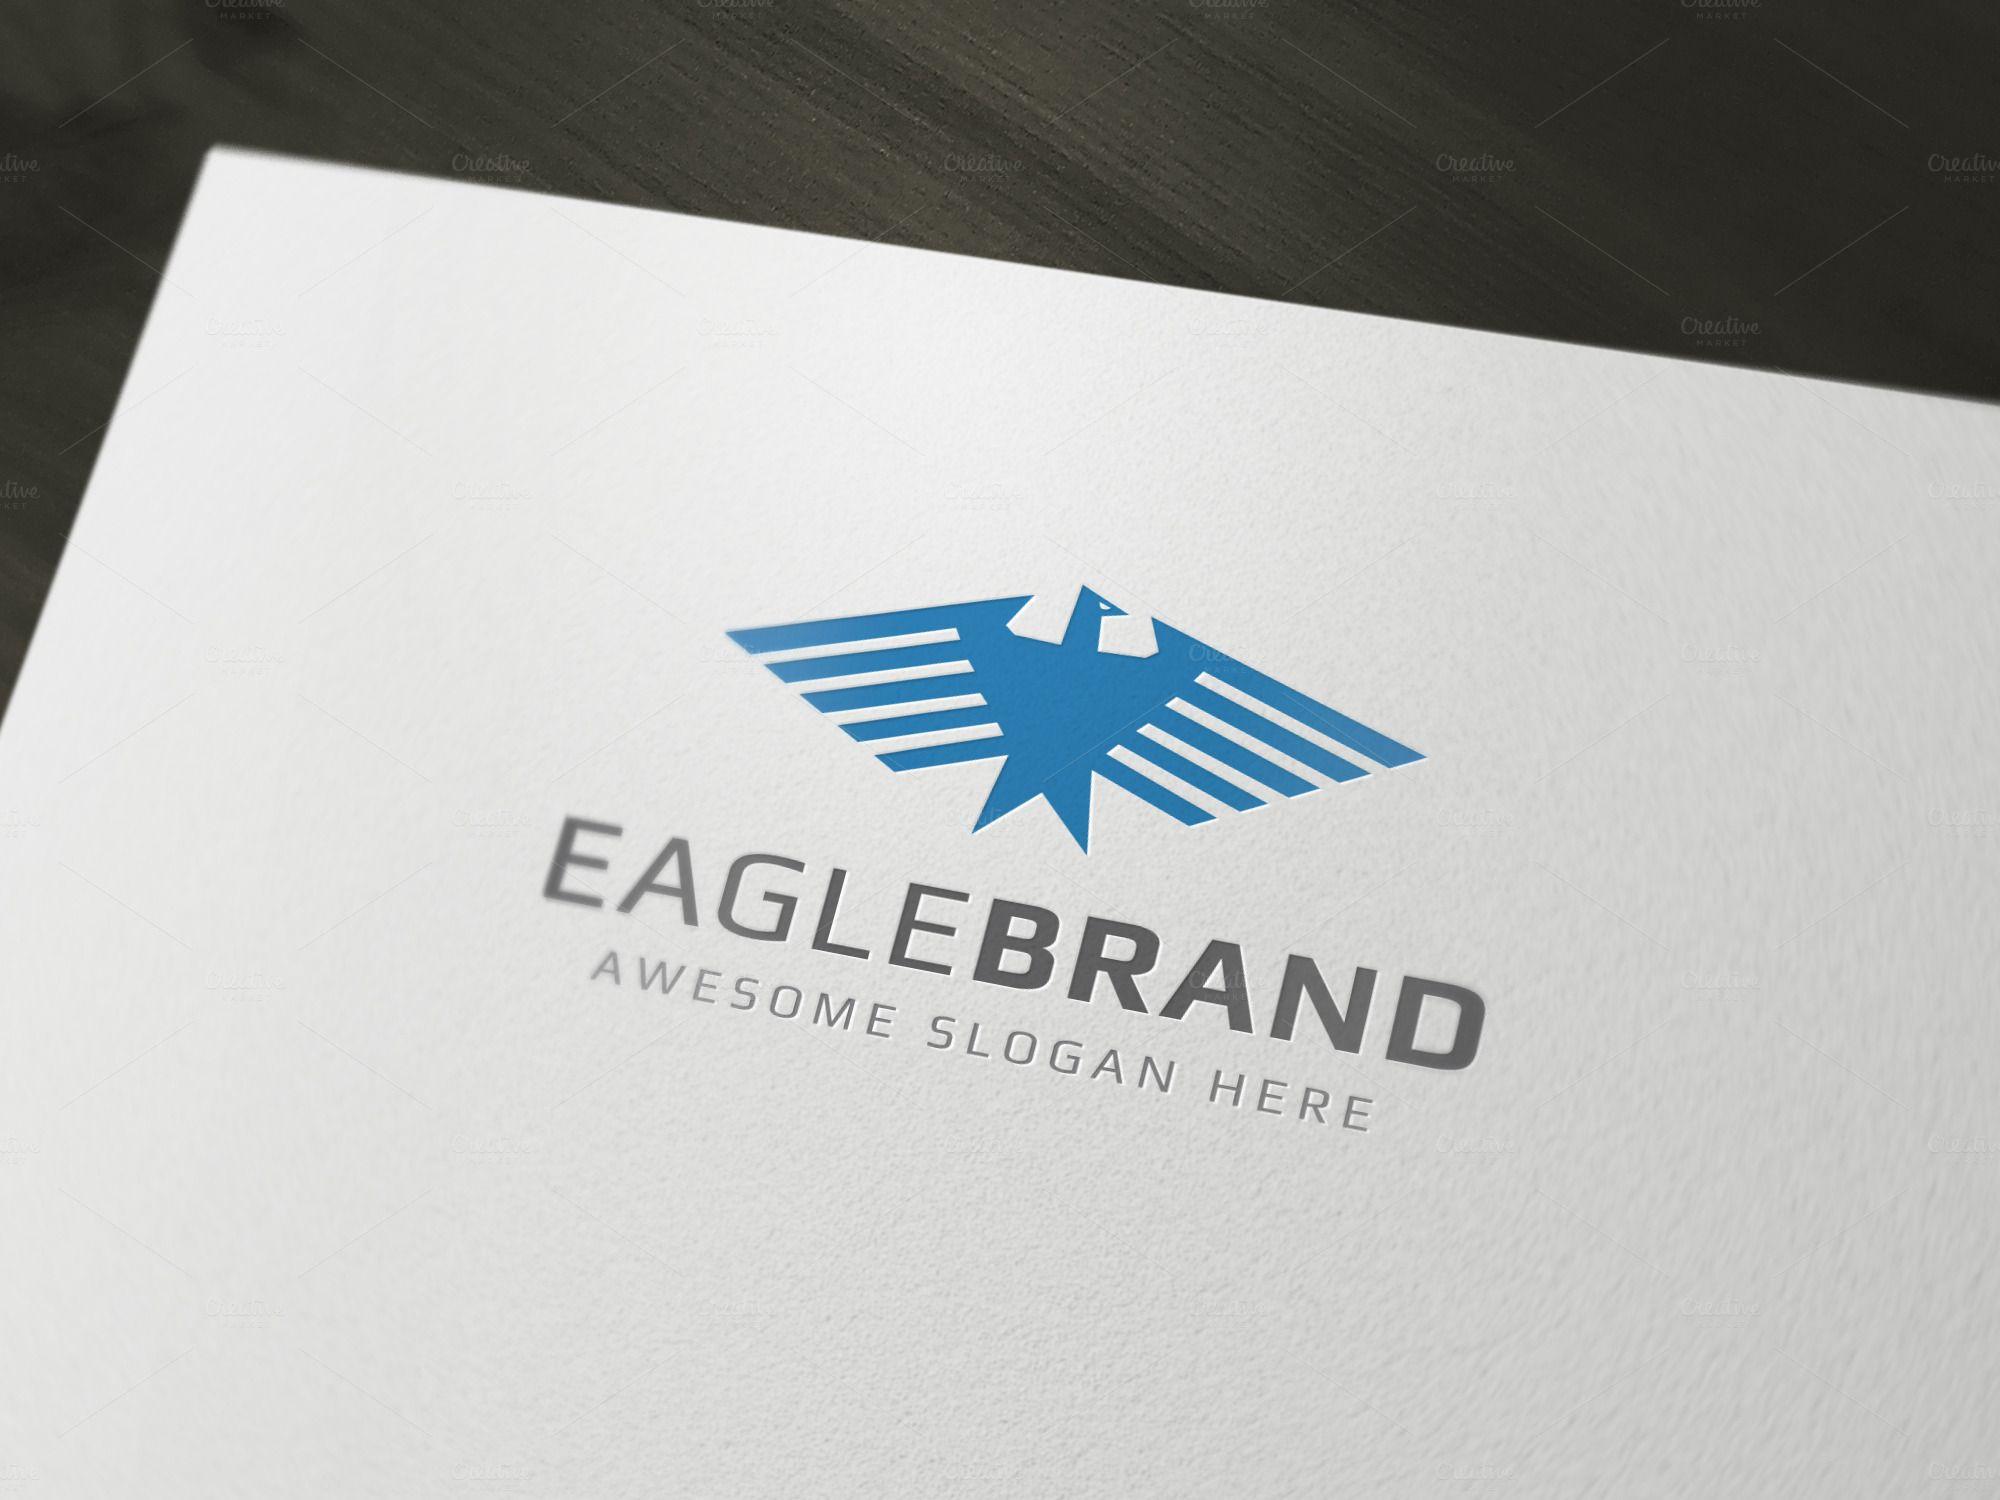 EagleBrand Logo Template by Mahamudul H. on Creative Market